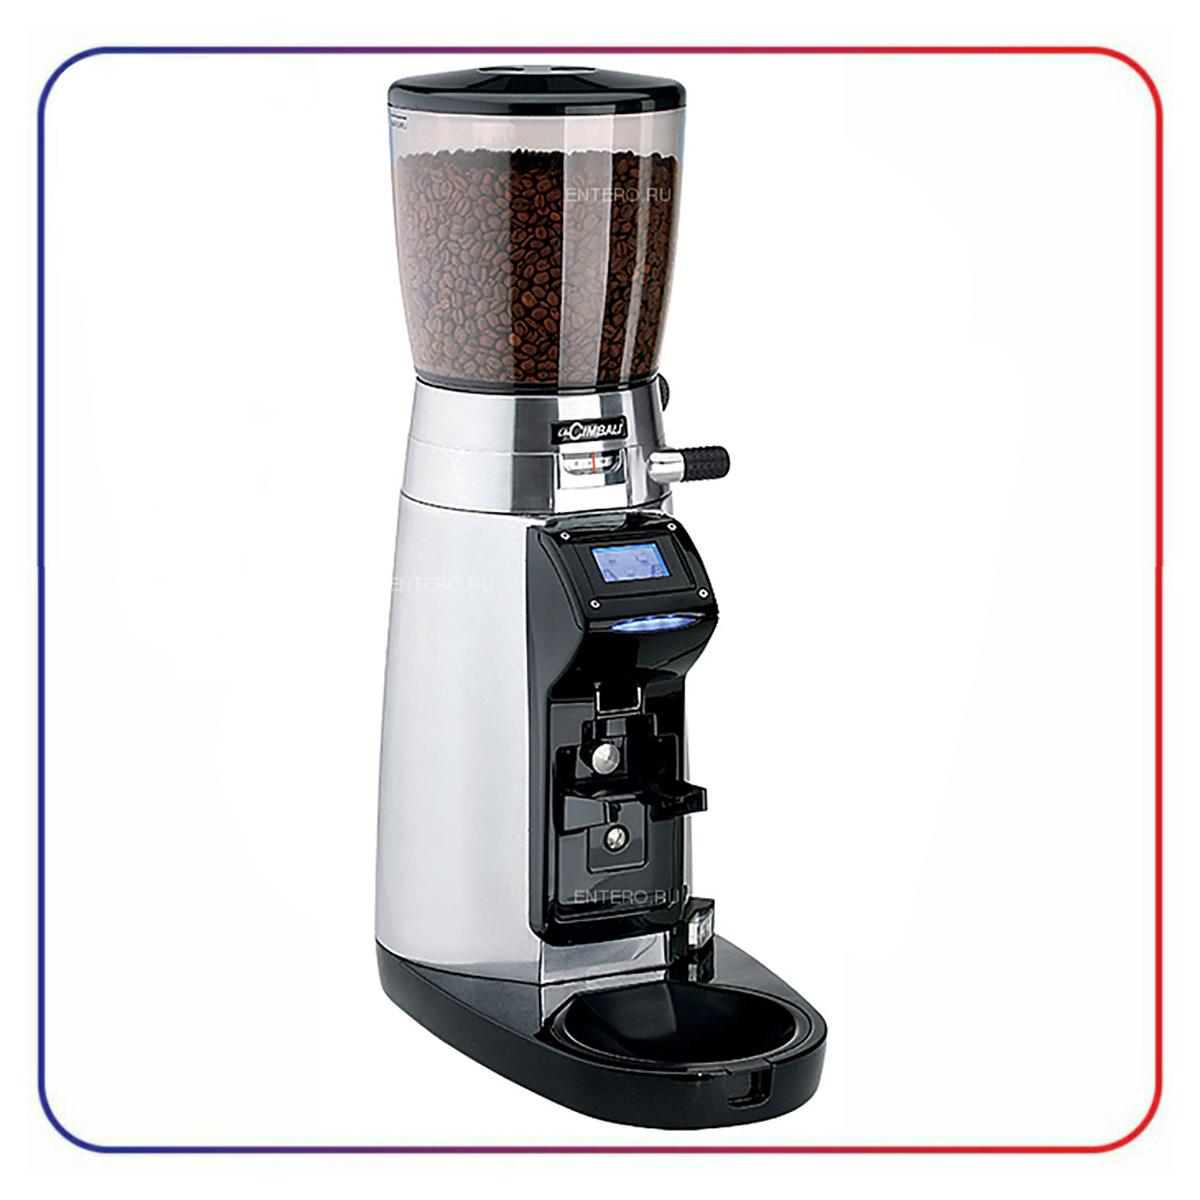 آسیاب قهوه جیمبالی اتوماتیک CIMBALI MAG O D TOUCH